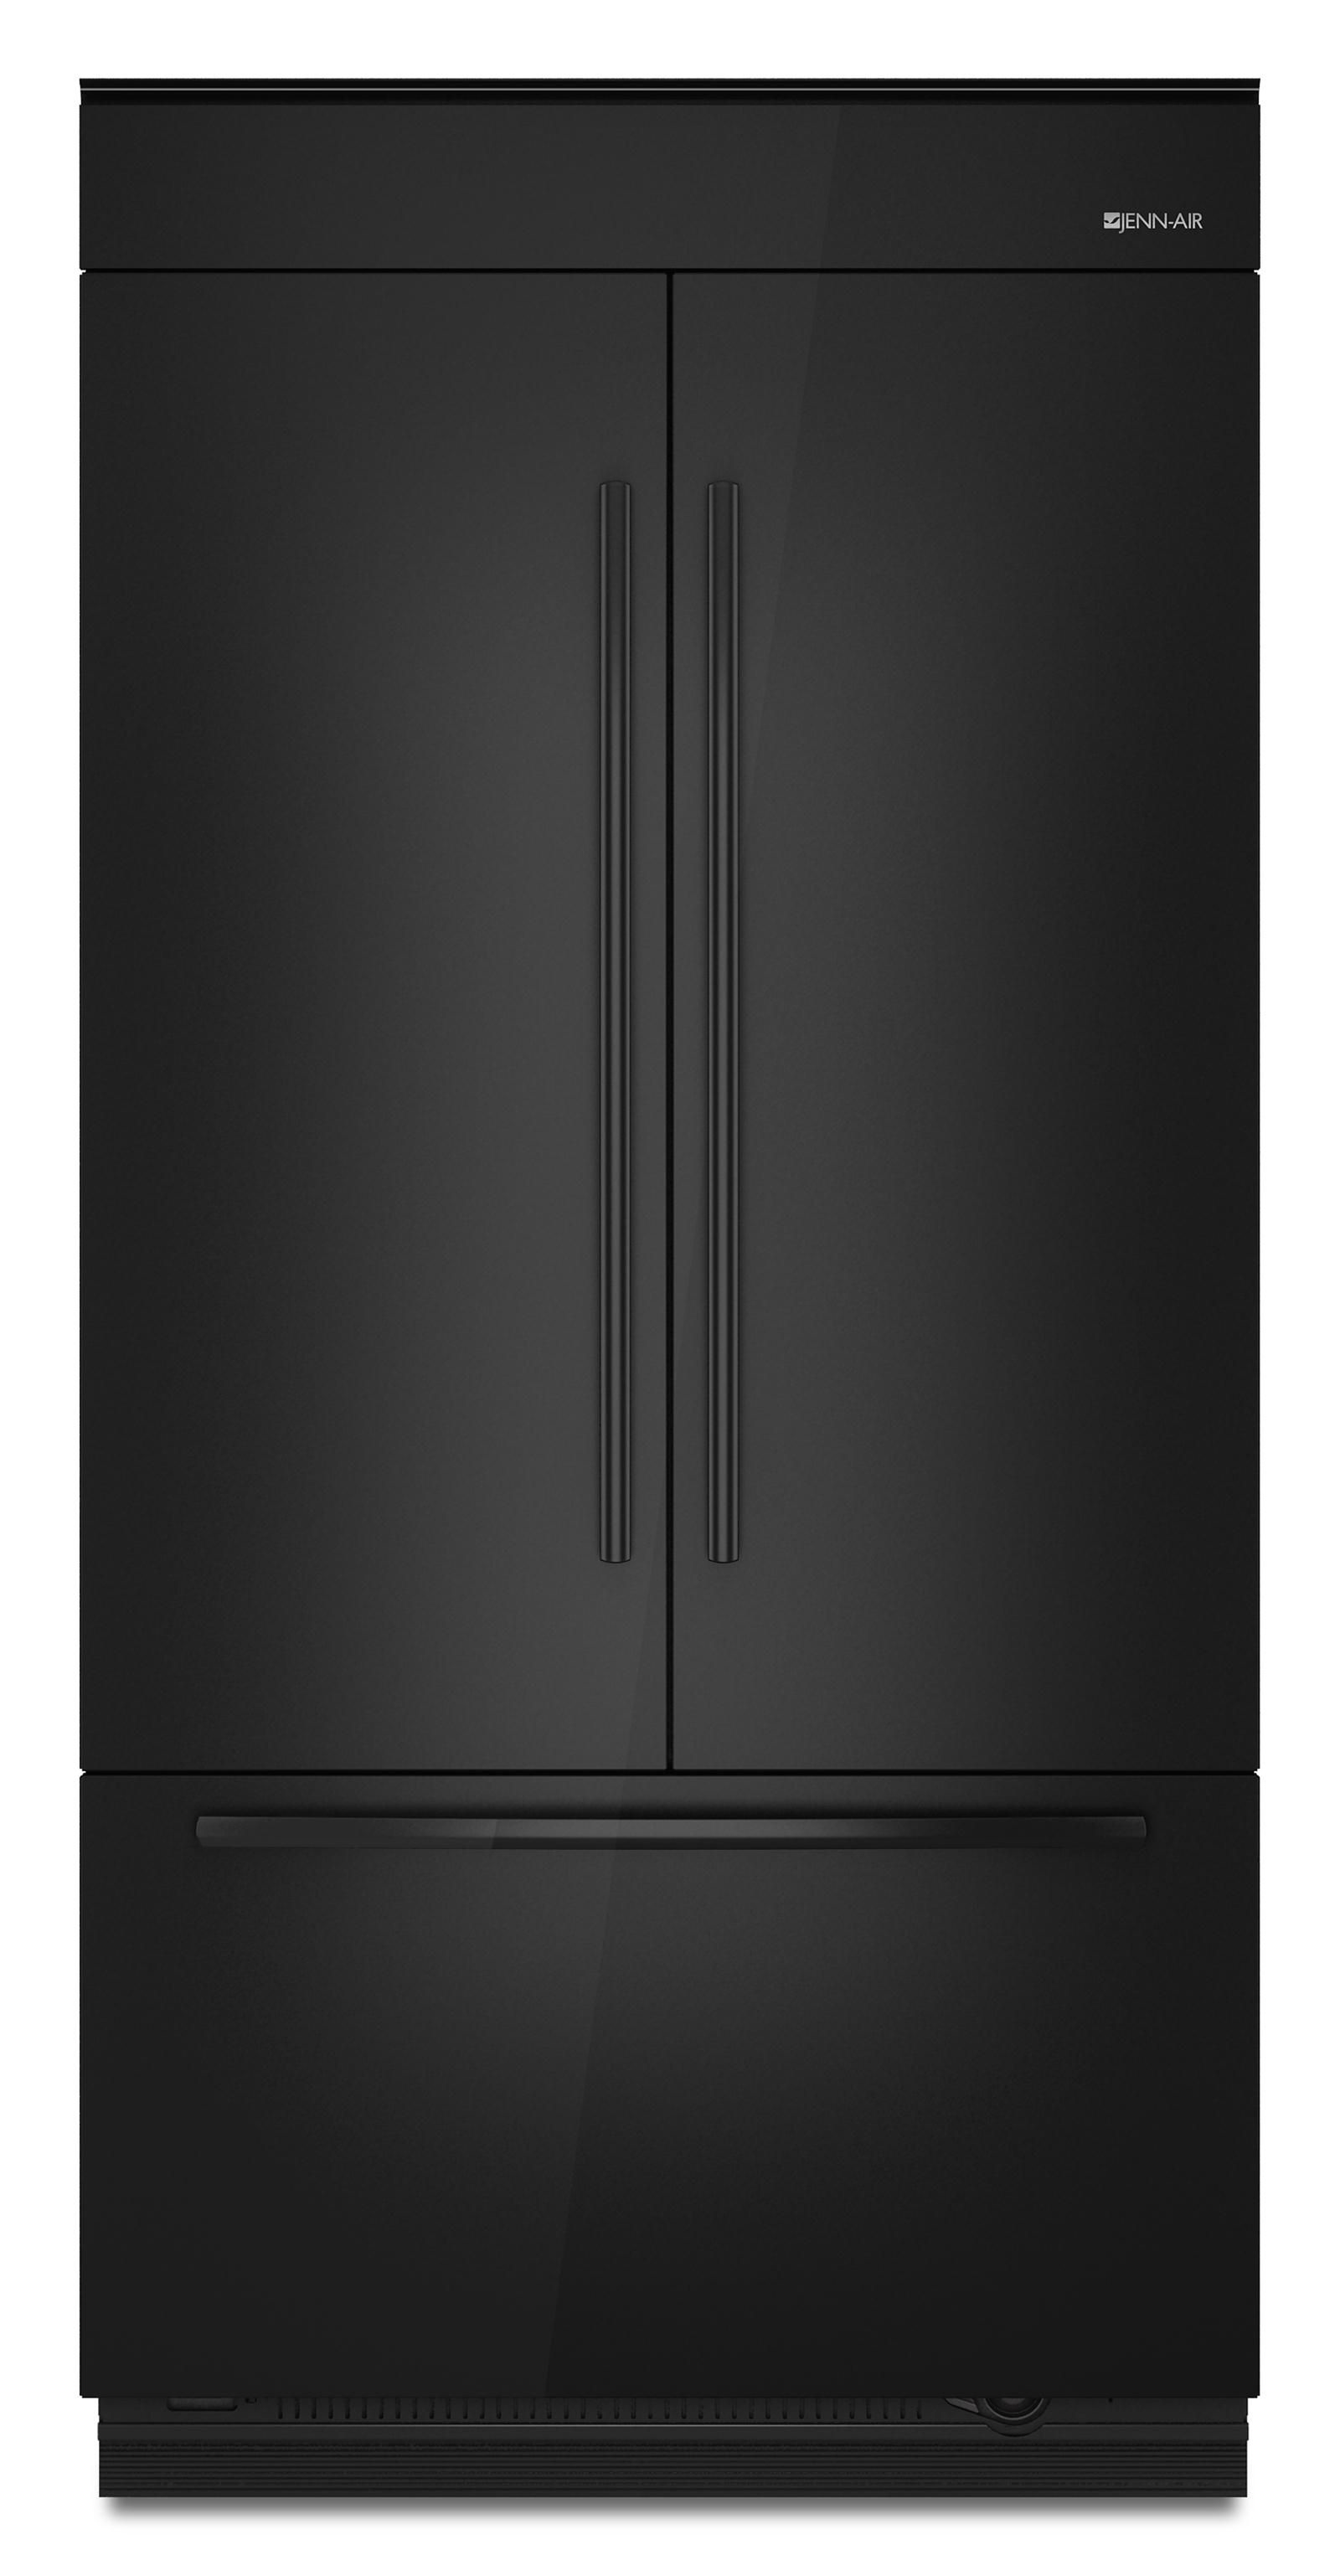 jenn air42 fully integrated built in french door refrigerator